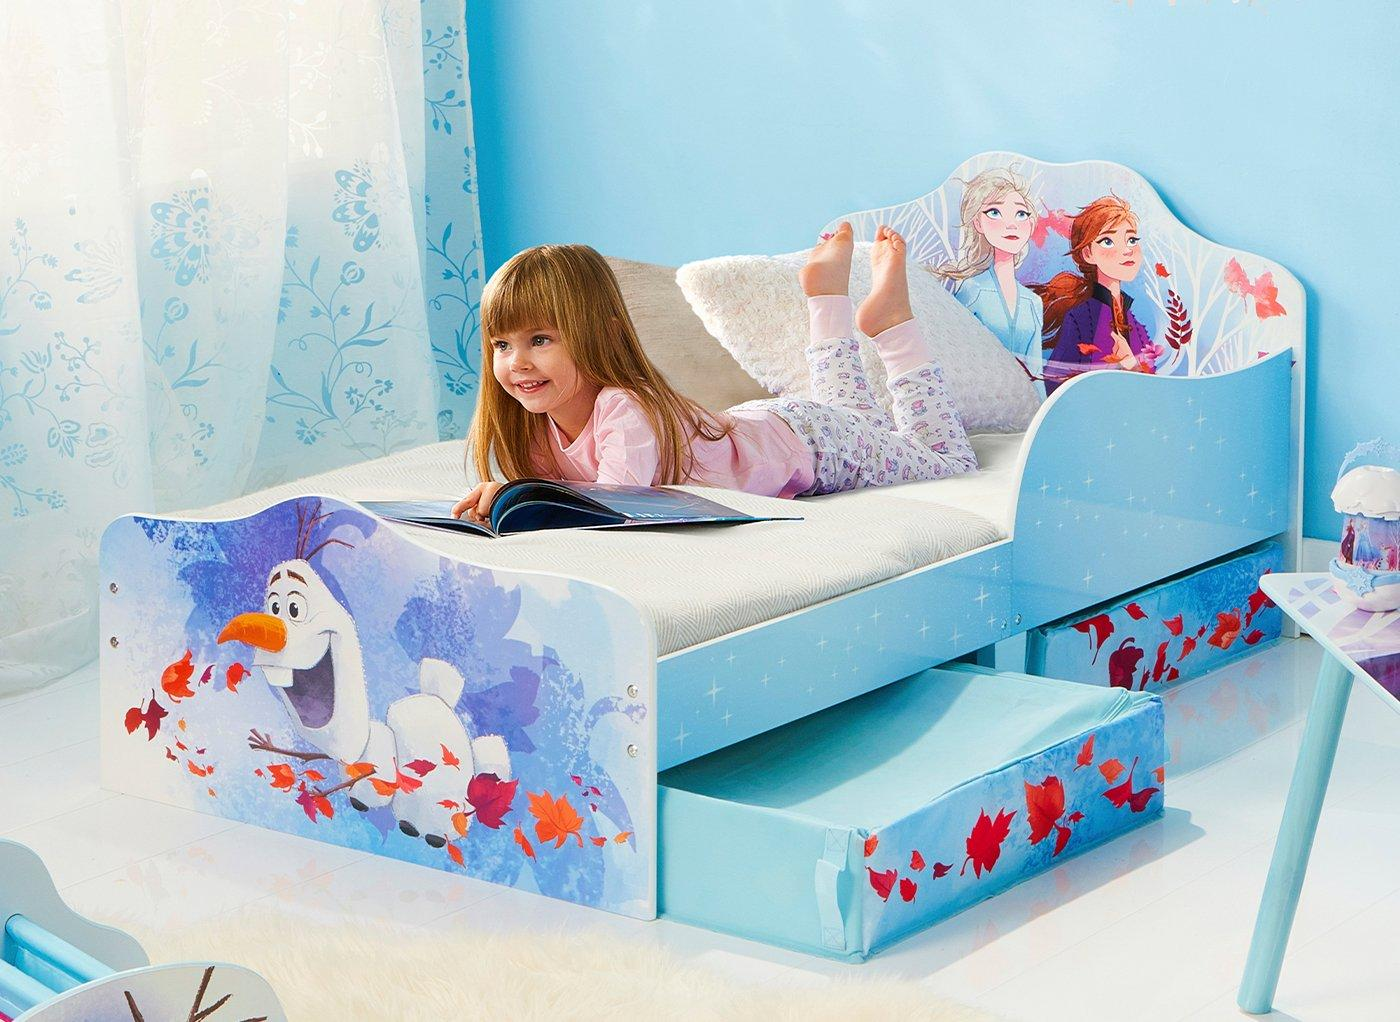 disney-frozen-toddler-bed-with-storage